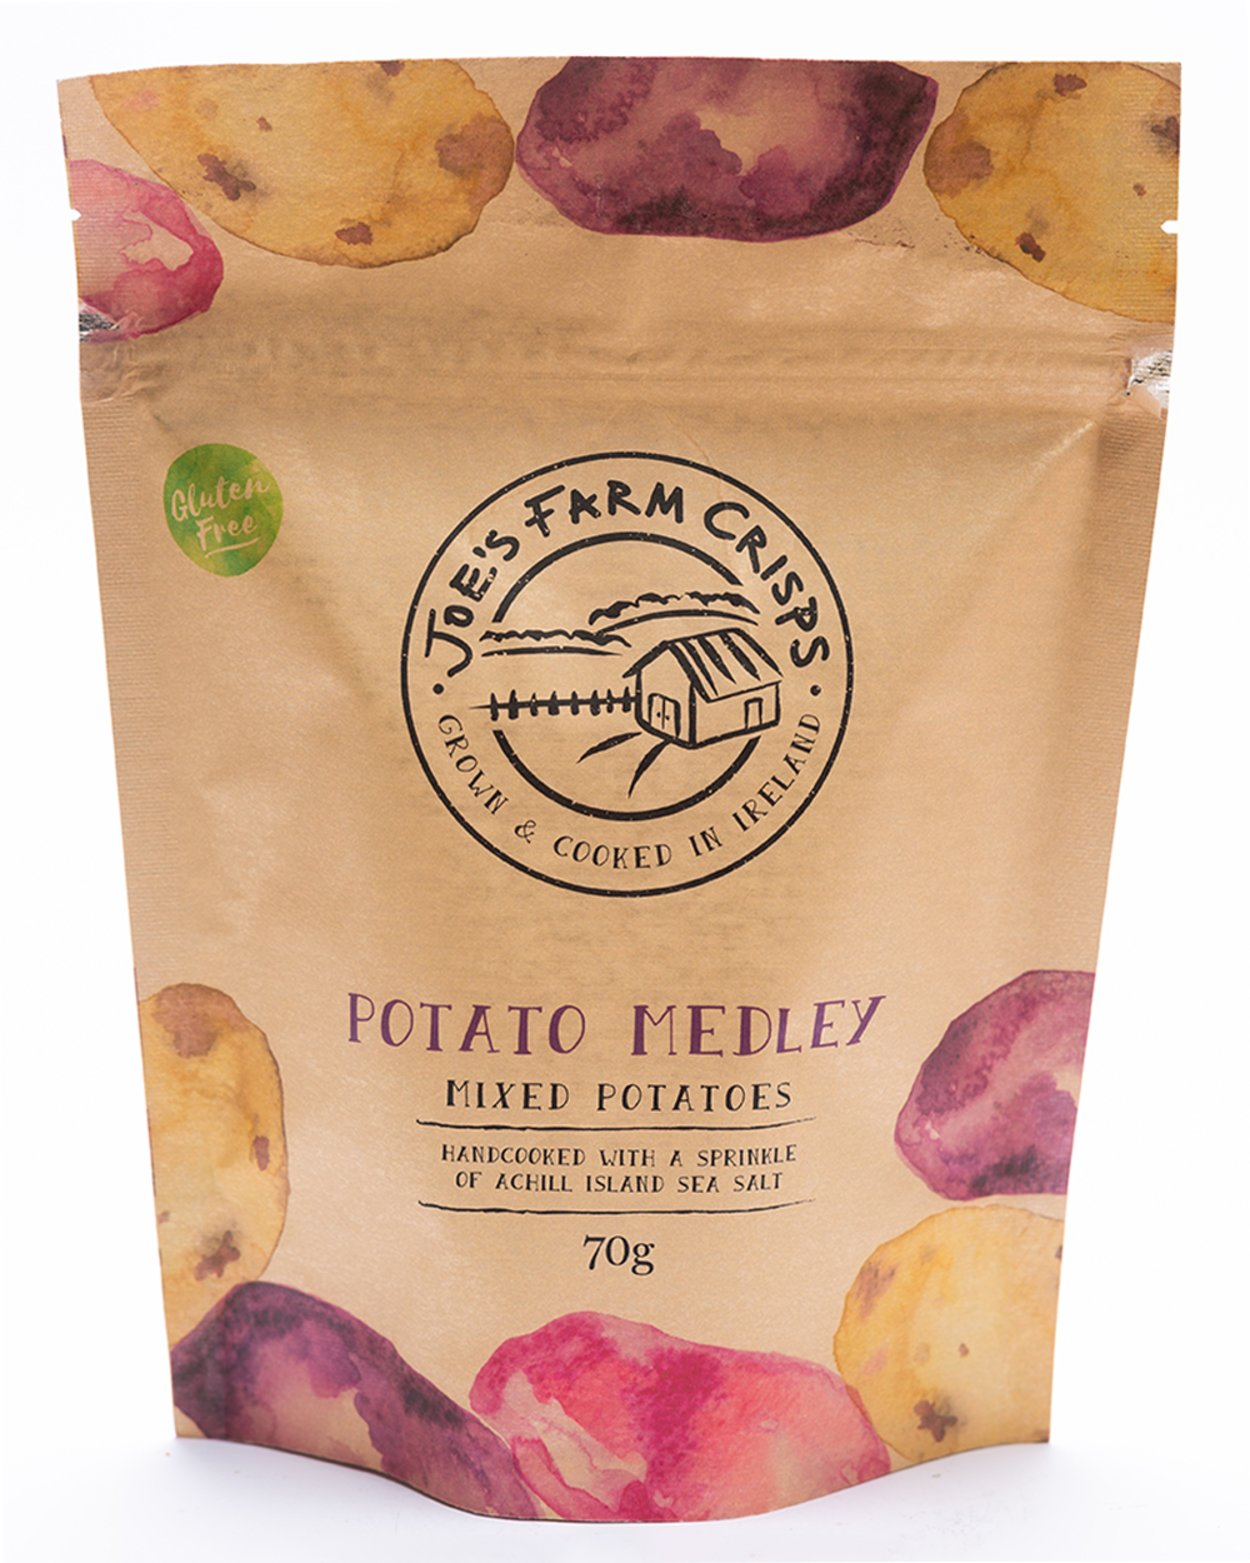 Joe's Farm Crisps Gluten Free Lightly Salted Potato Crisps